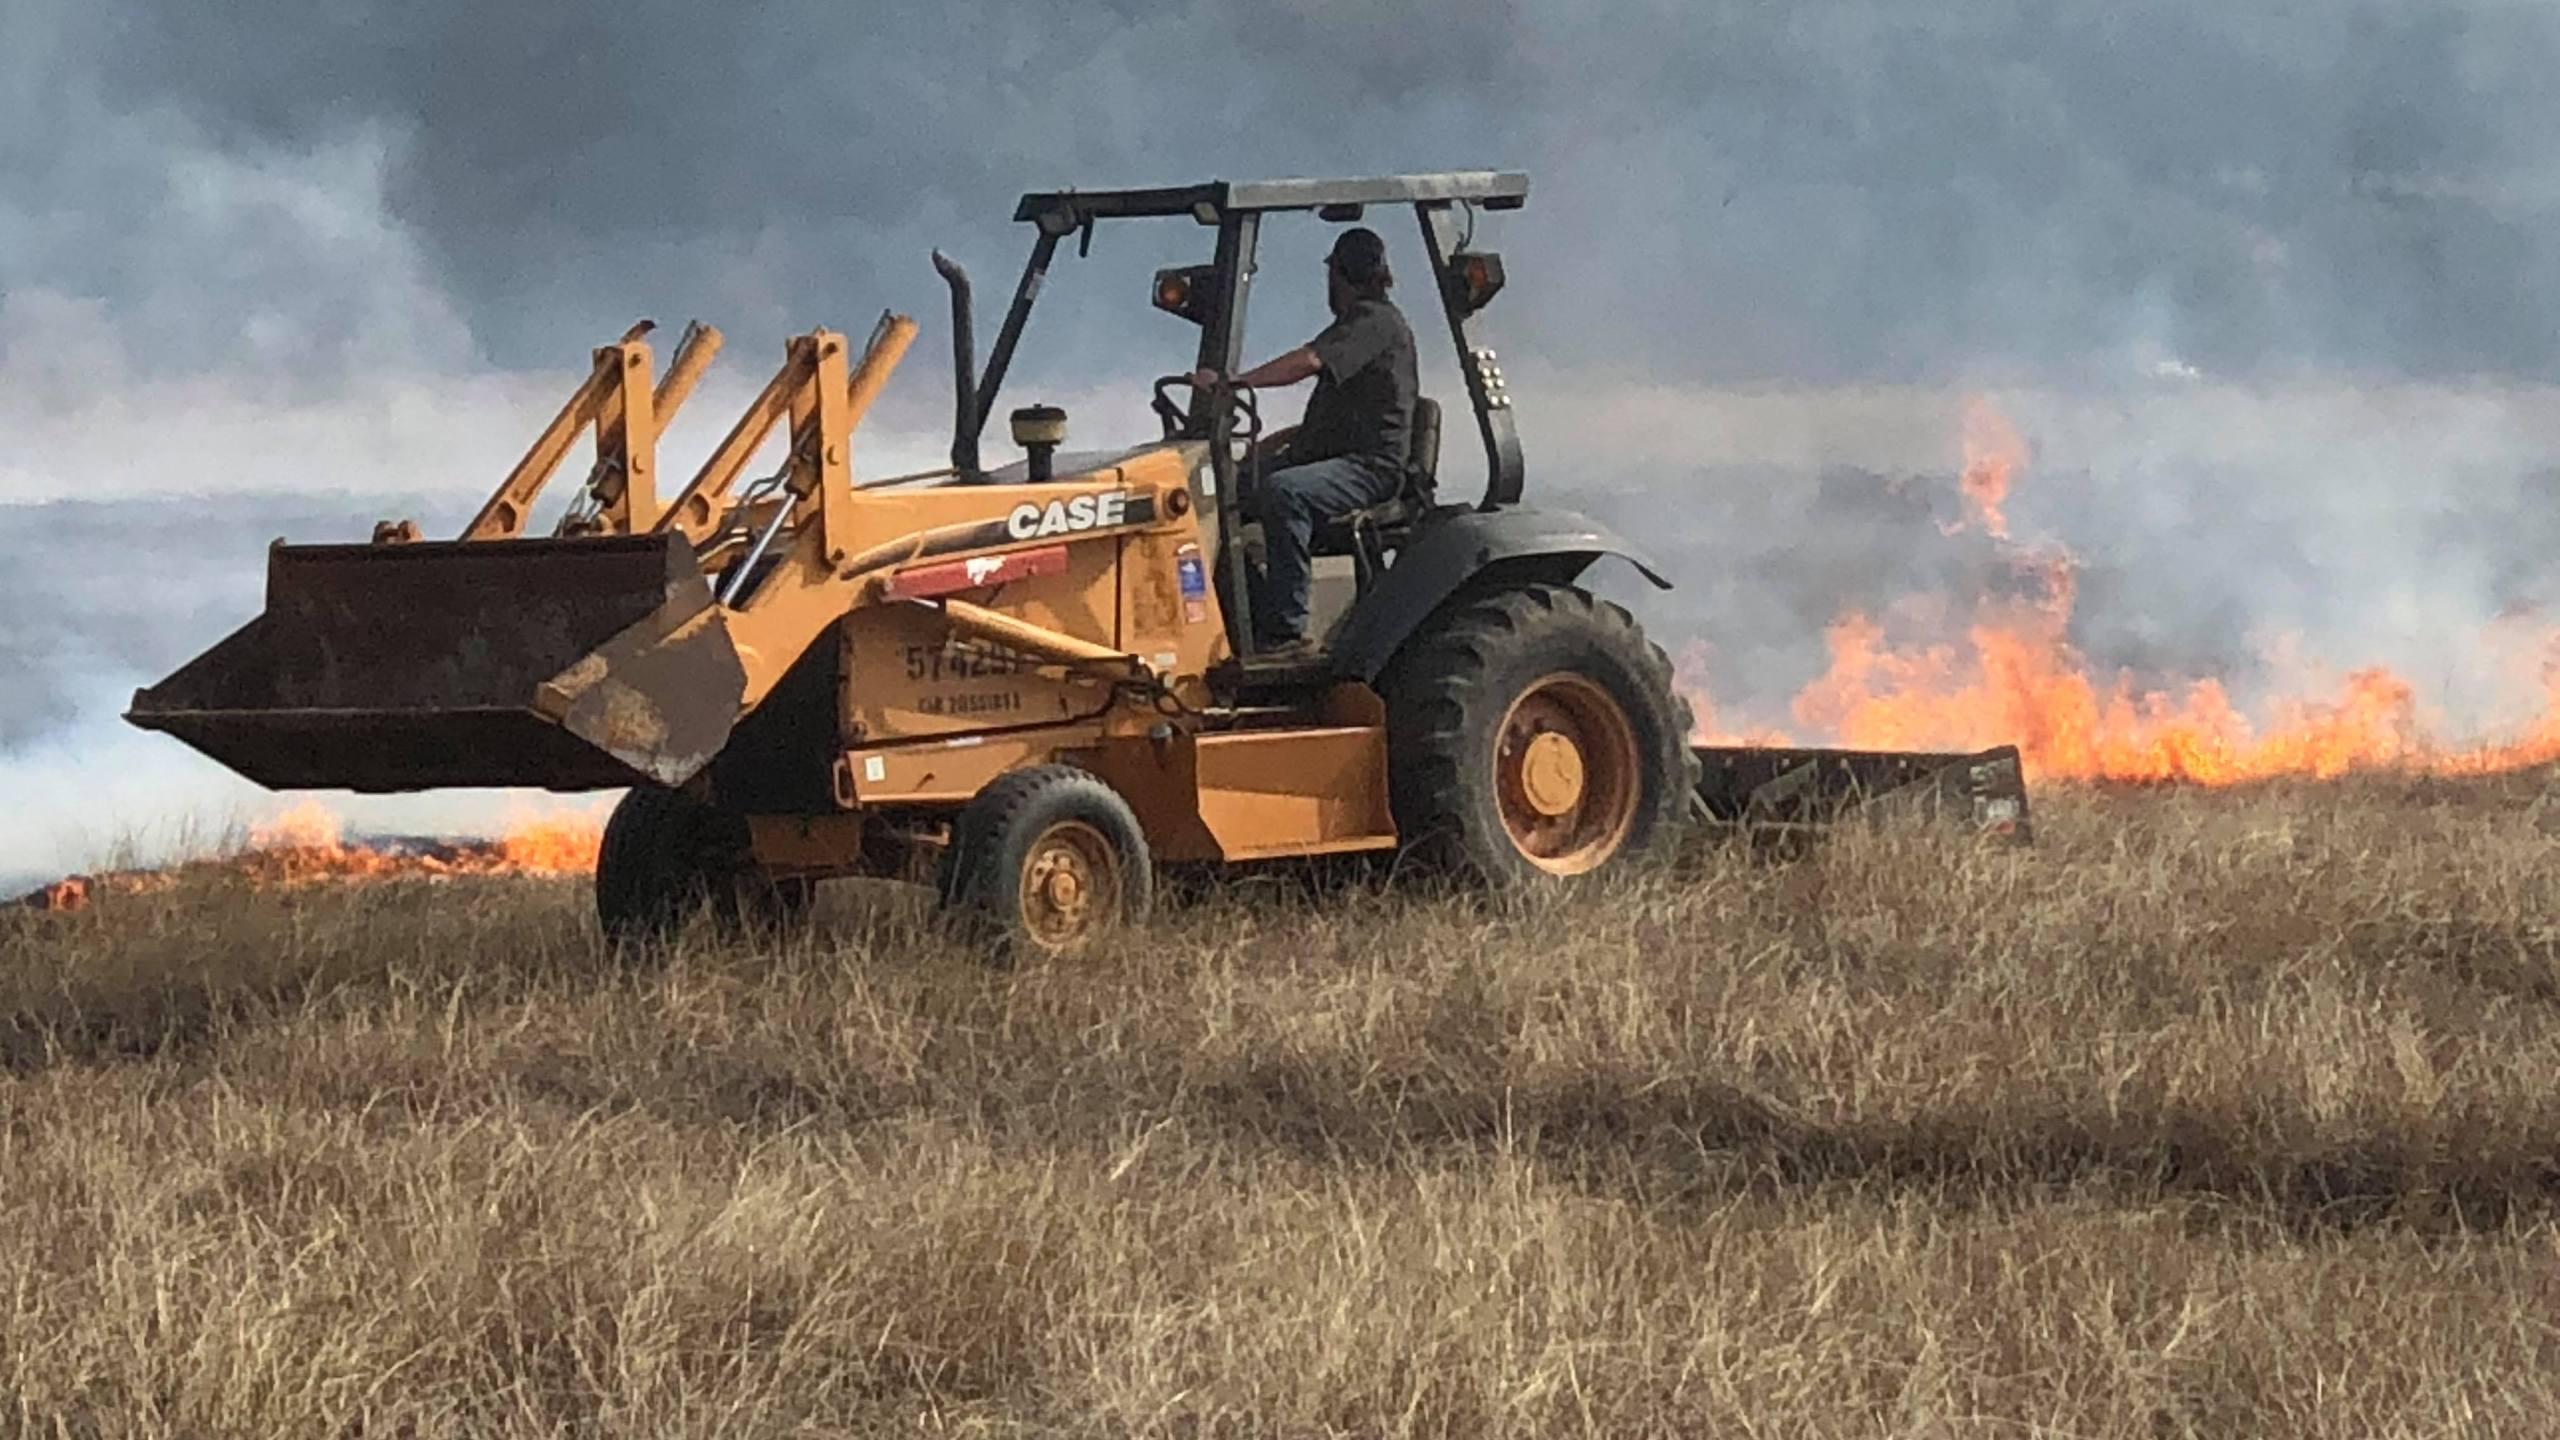 Wimberley brush fire - Jesse fighting the fire_626359